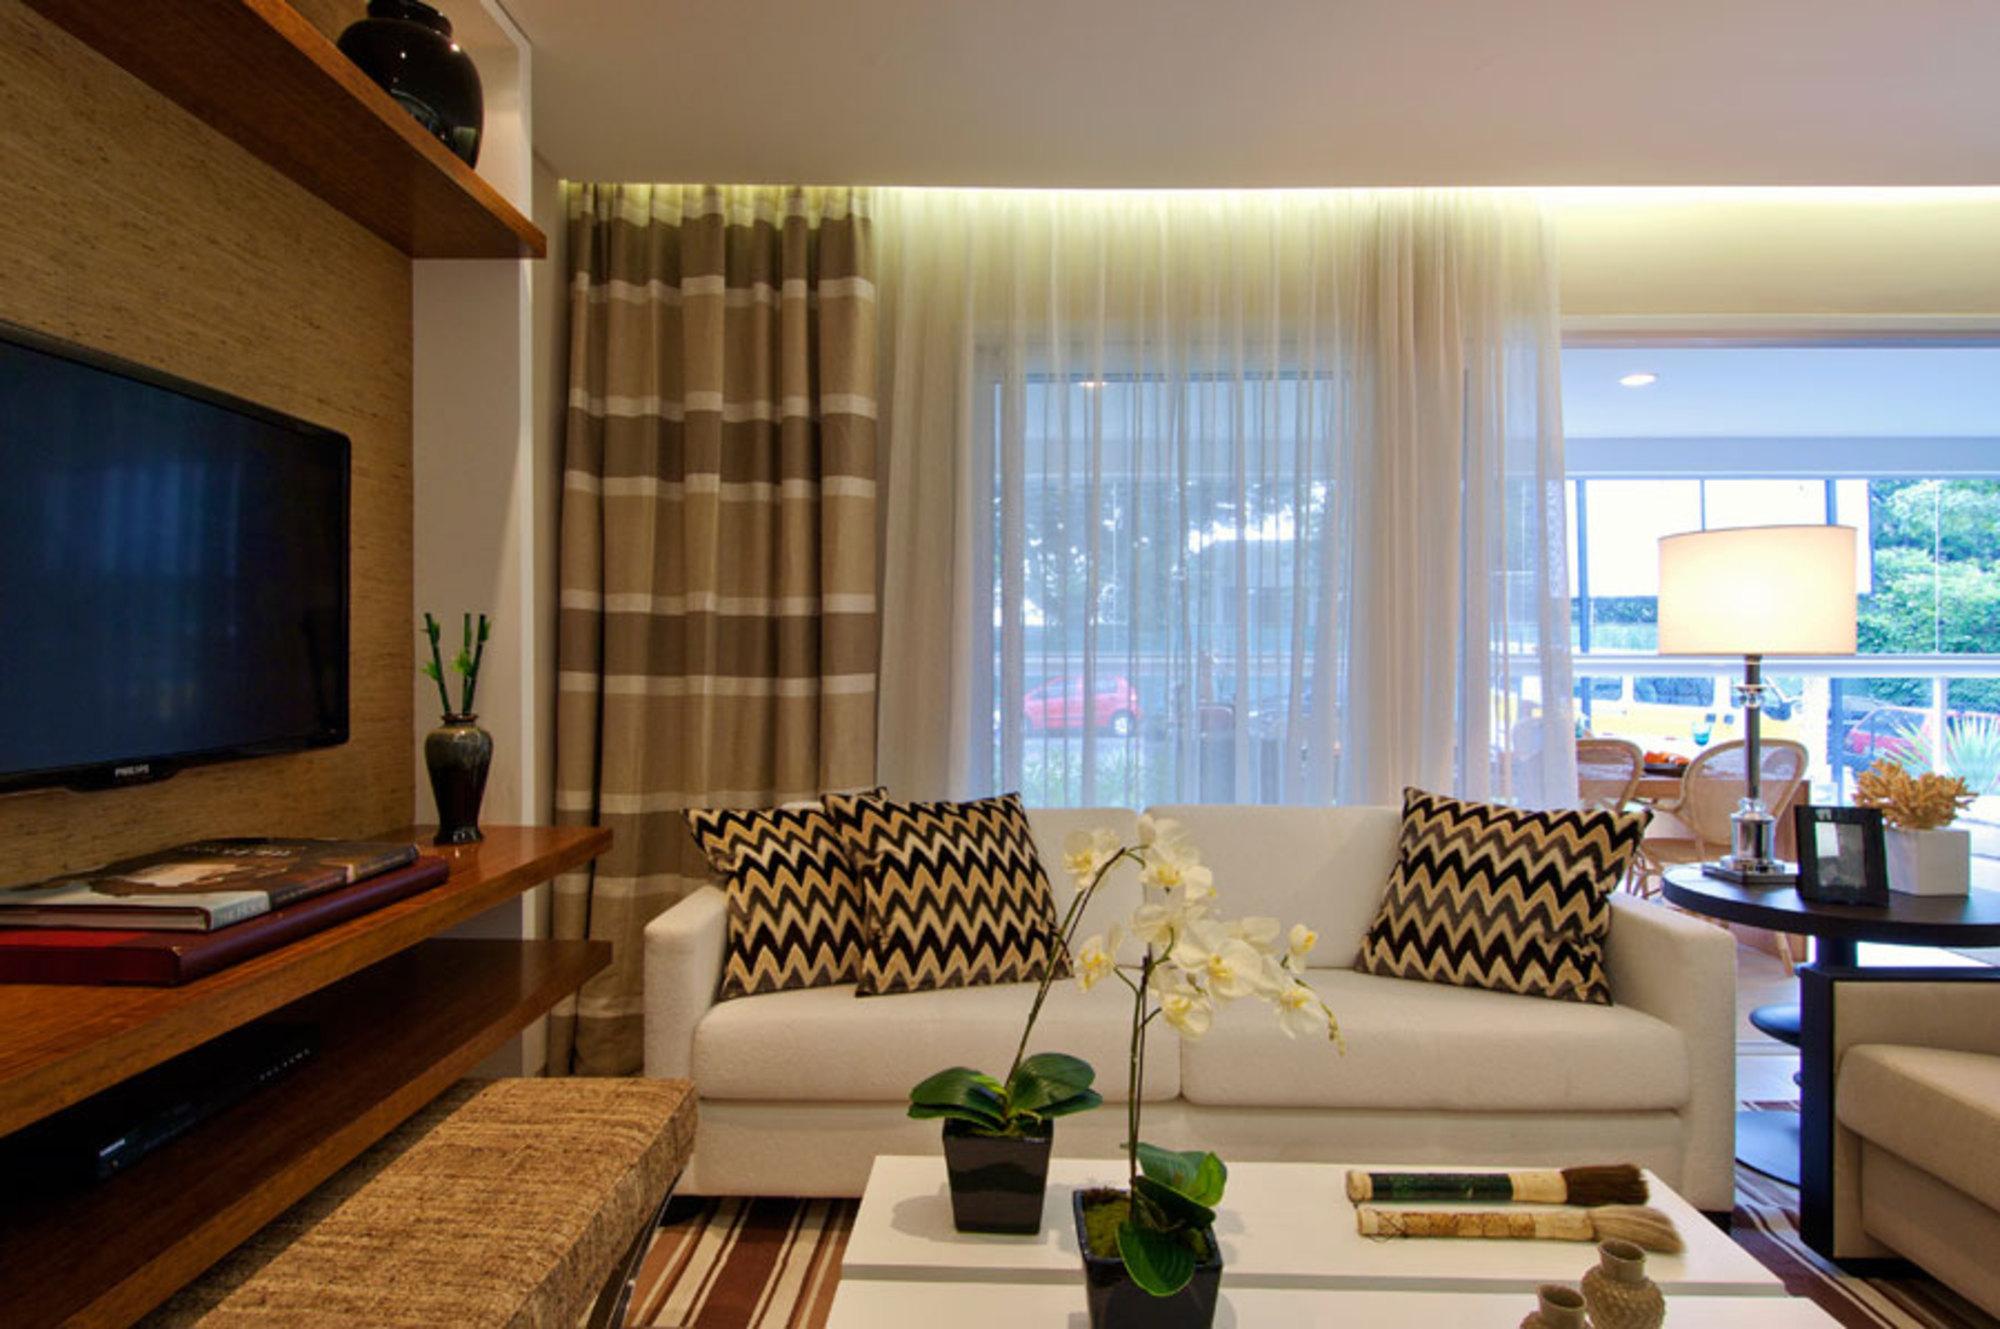 Apartamento modelo casa de valentina for Apartamento modelo